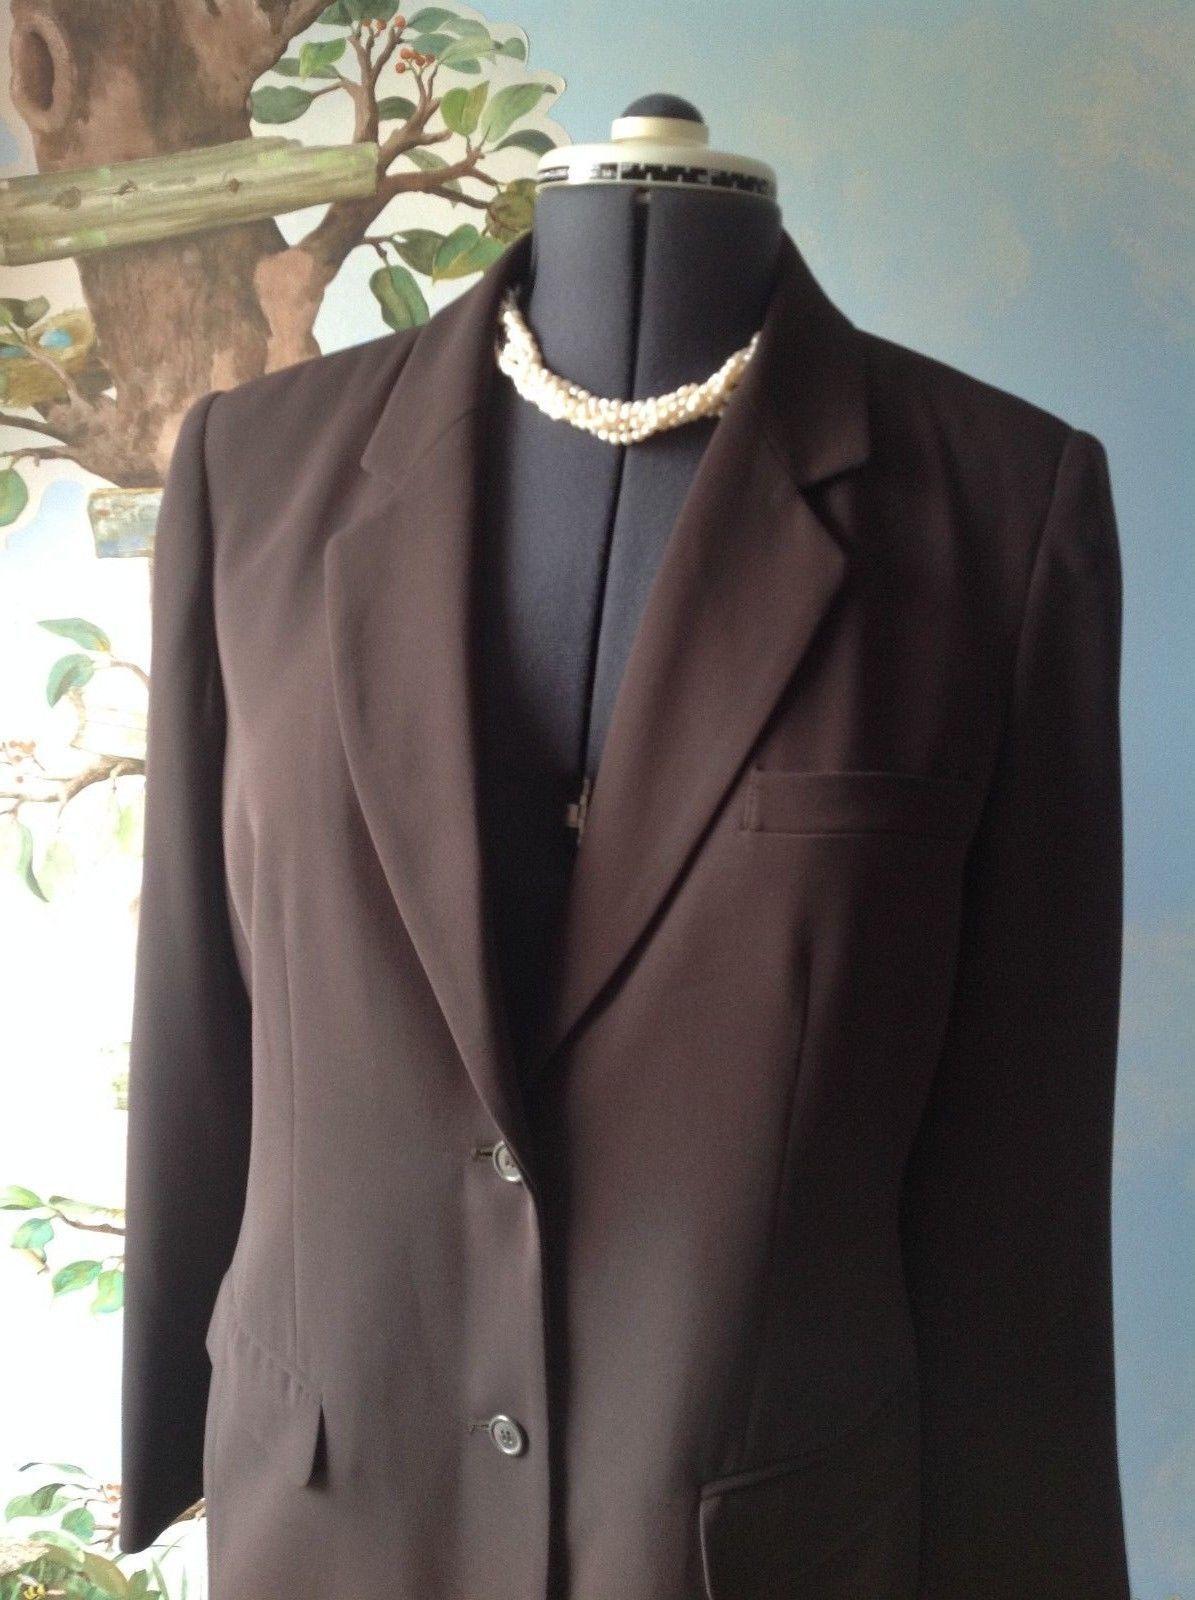 Laura Scott Petite Women's Brown Long Sleeve Suit Jacket Blazer Size 12P